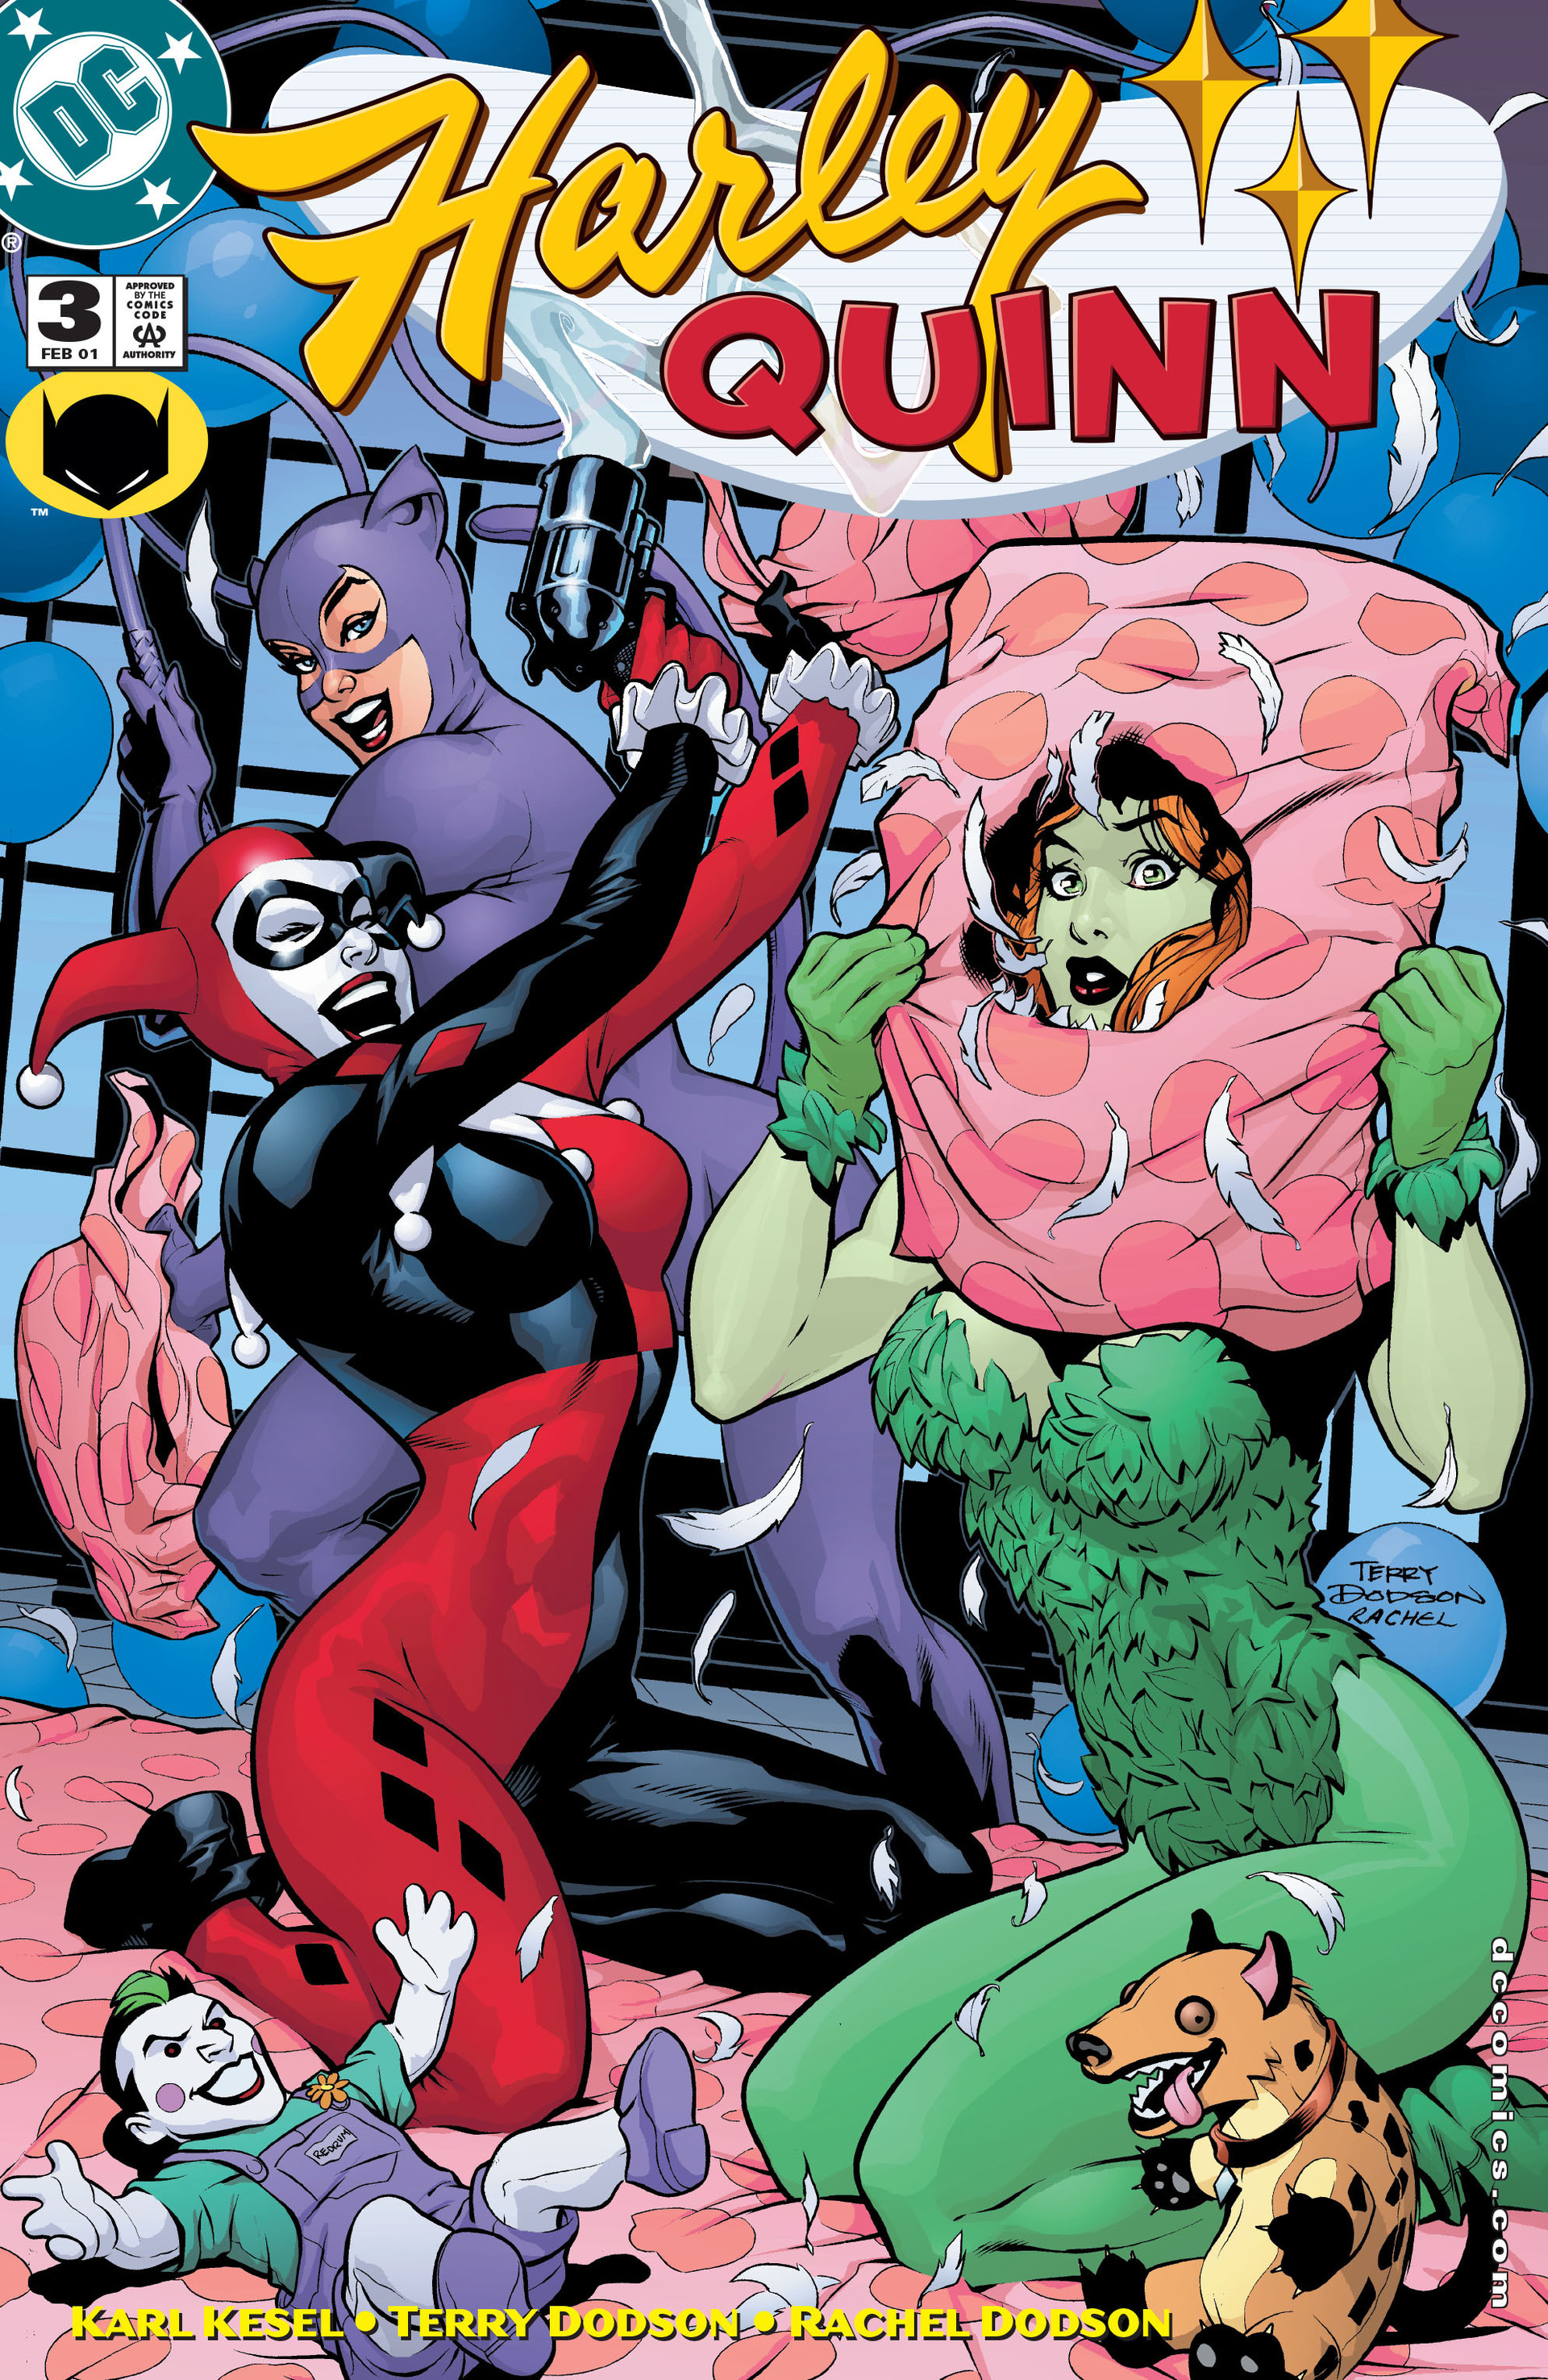 Harley Quinn Vol.1 #3